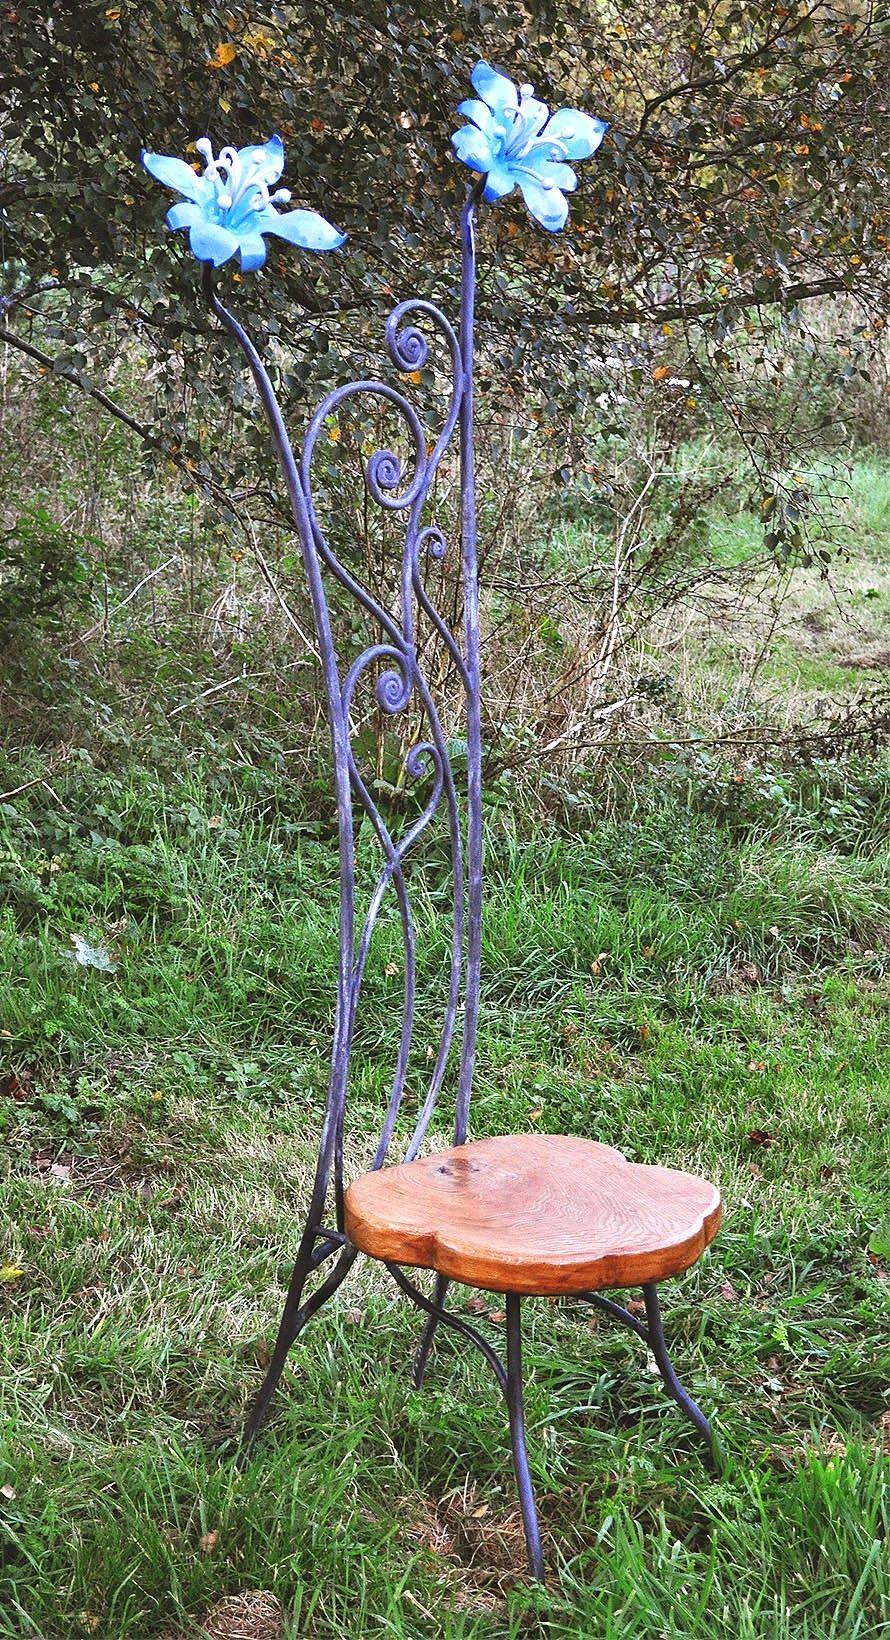 Sculpture and garden art  artistic metal furniture and